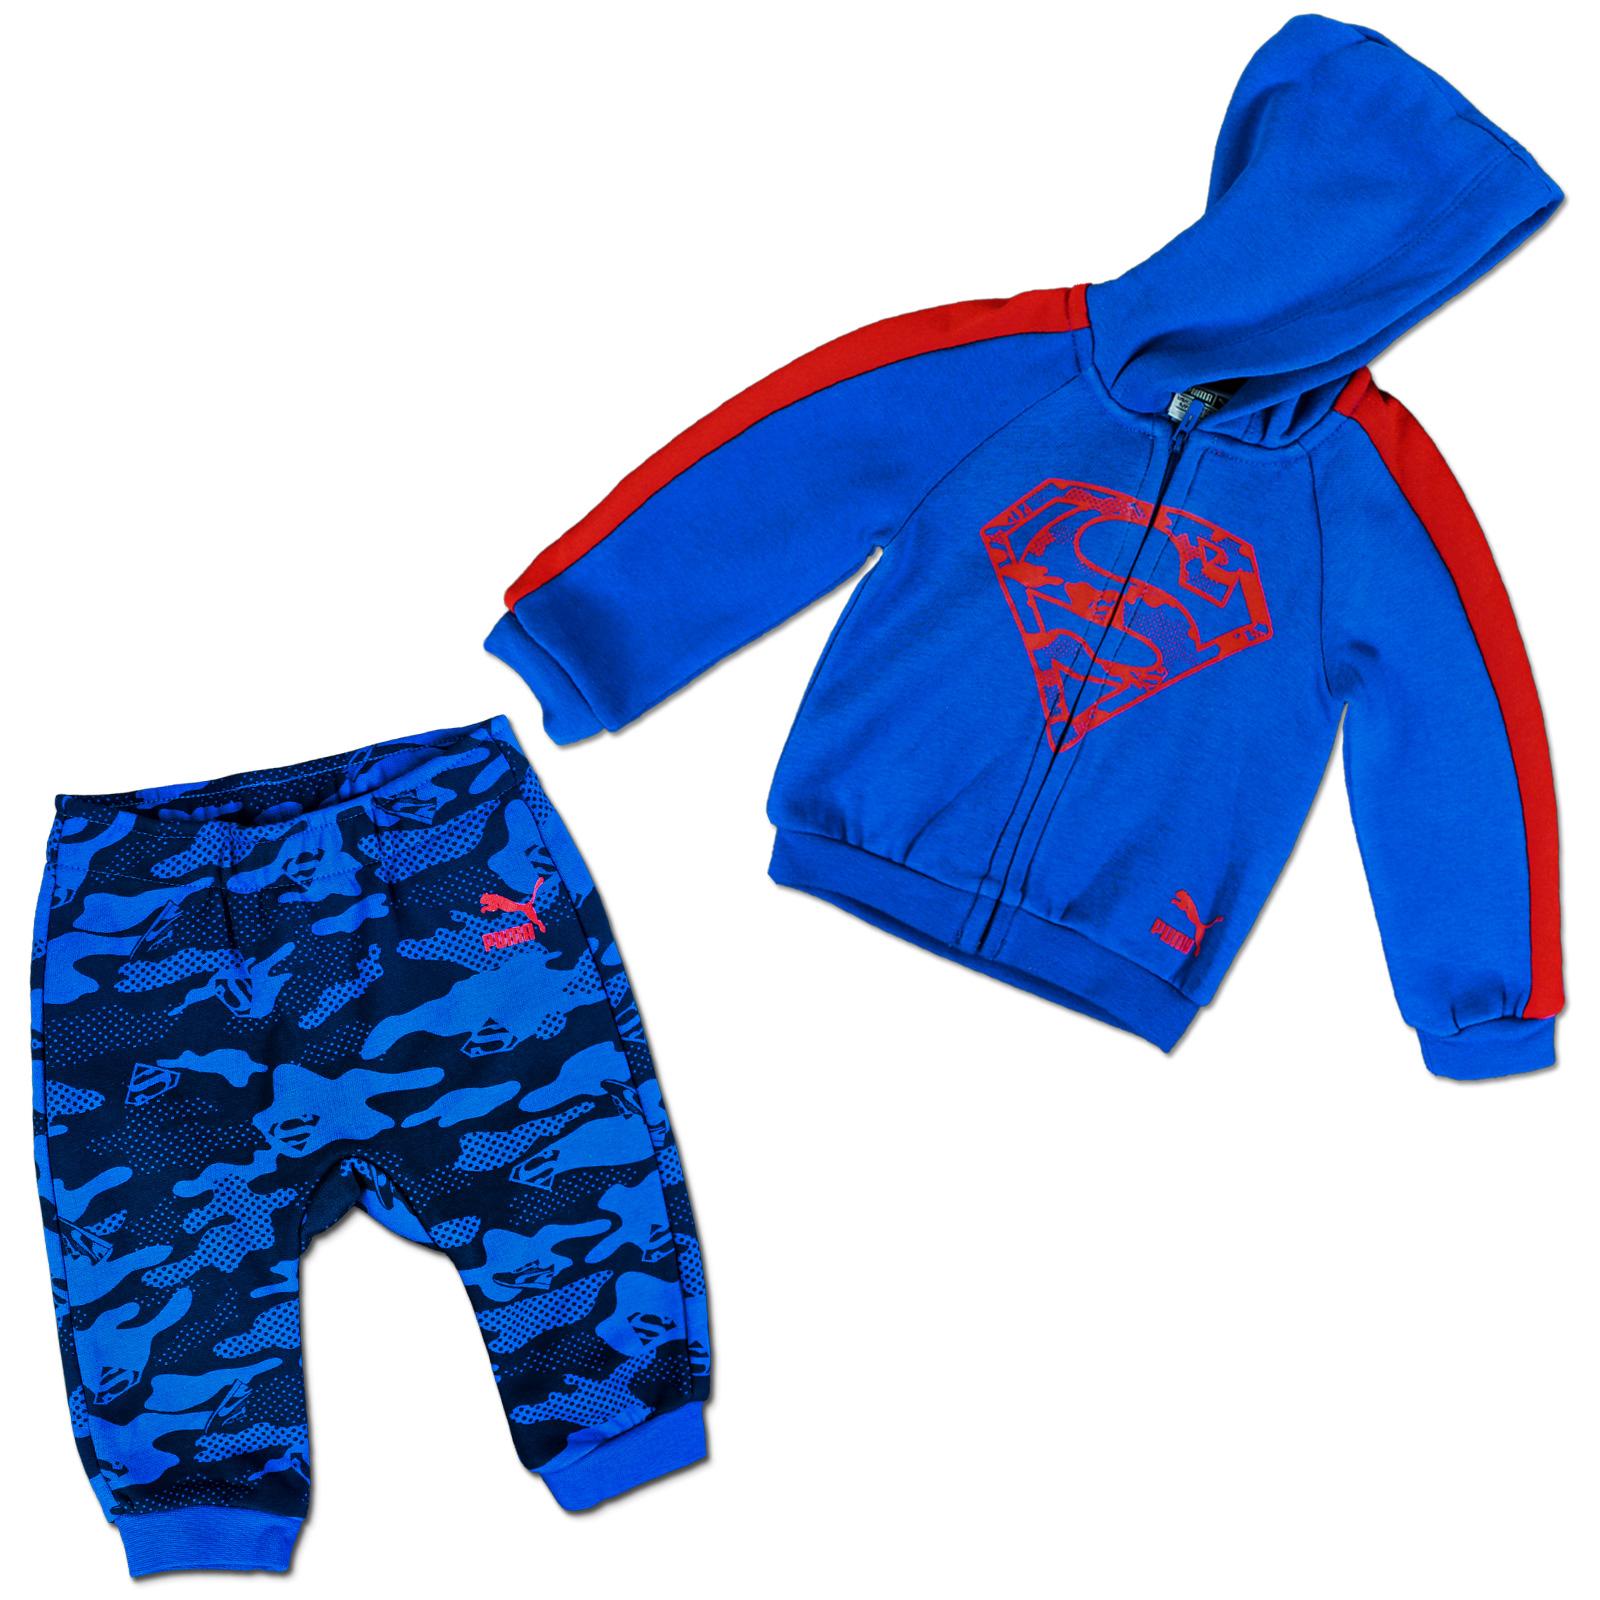 Outlet Store Verkauf Talsohle Preis vorbestellen PUMA KINDER BABY SUPERMAN JOGGER TRAININGSANZUG SPORT ANZUG JACKE + HOSE  BLAU